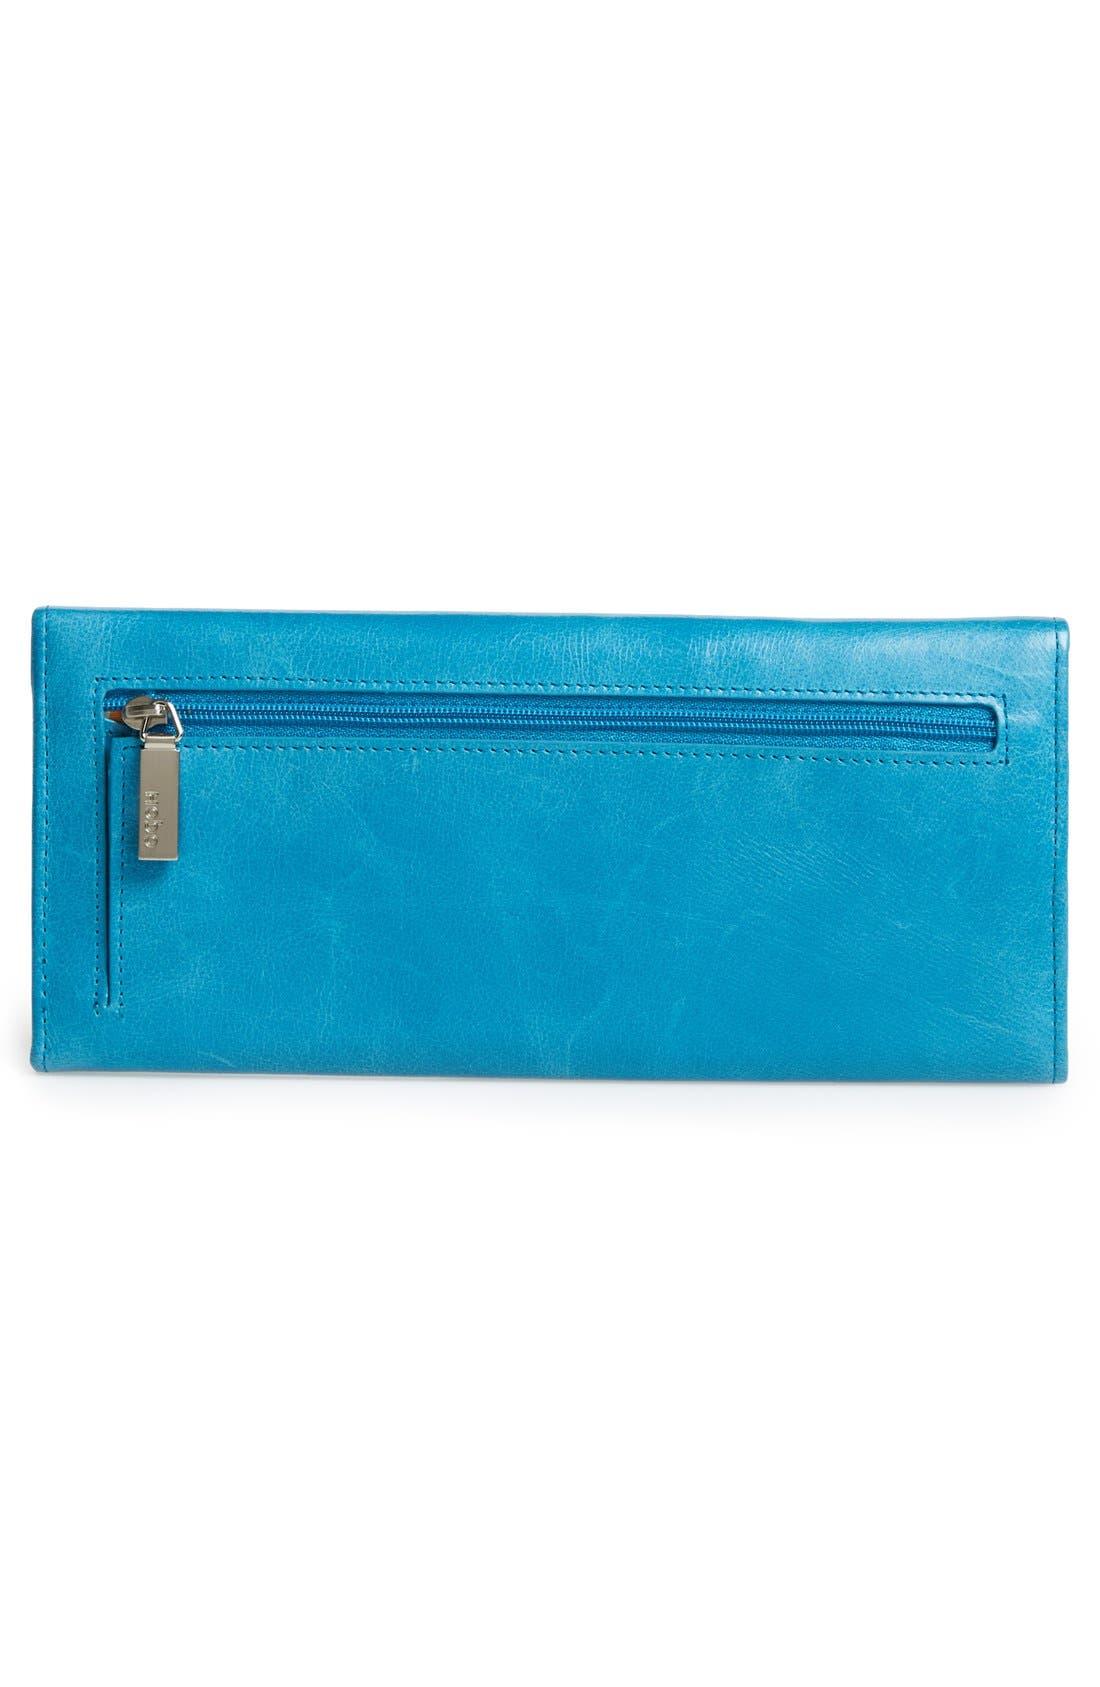 'Sadie' Leather Wallet,                             Alternate thumbnail 124, color,